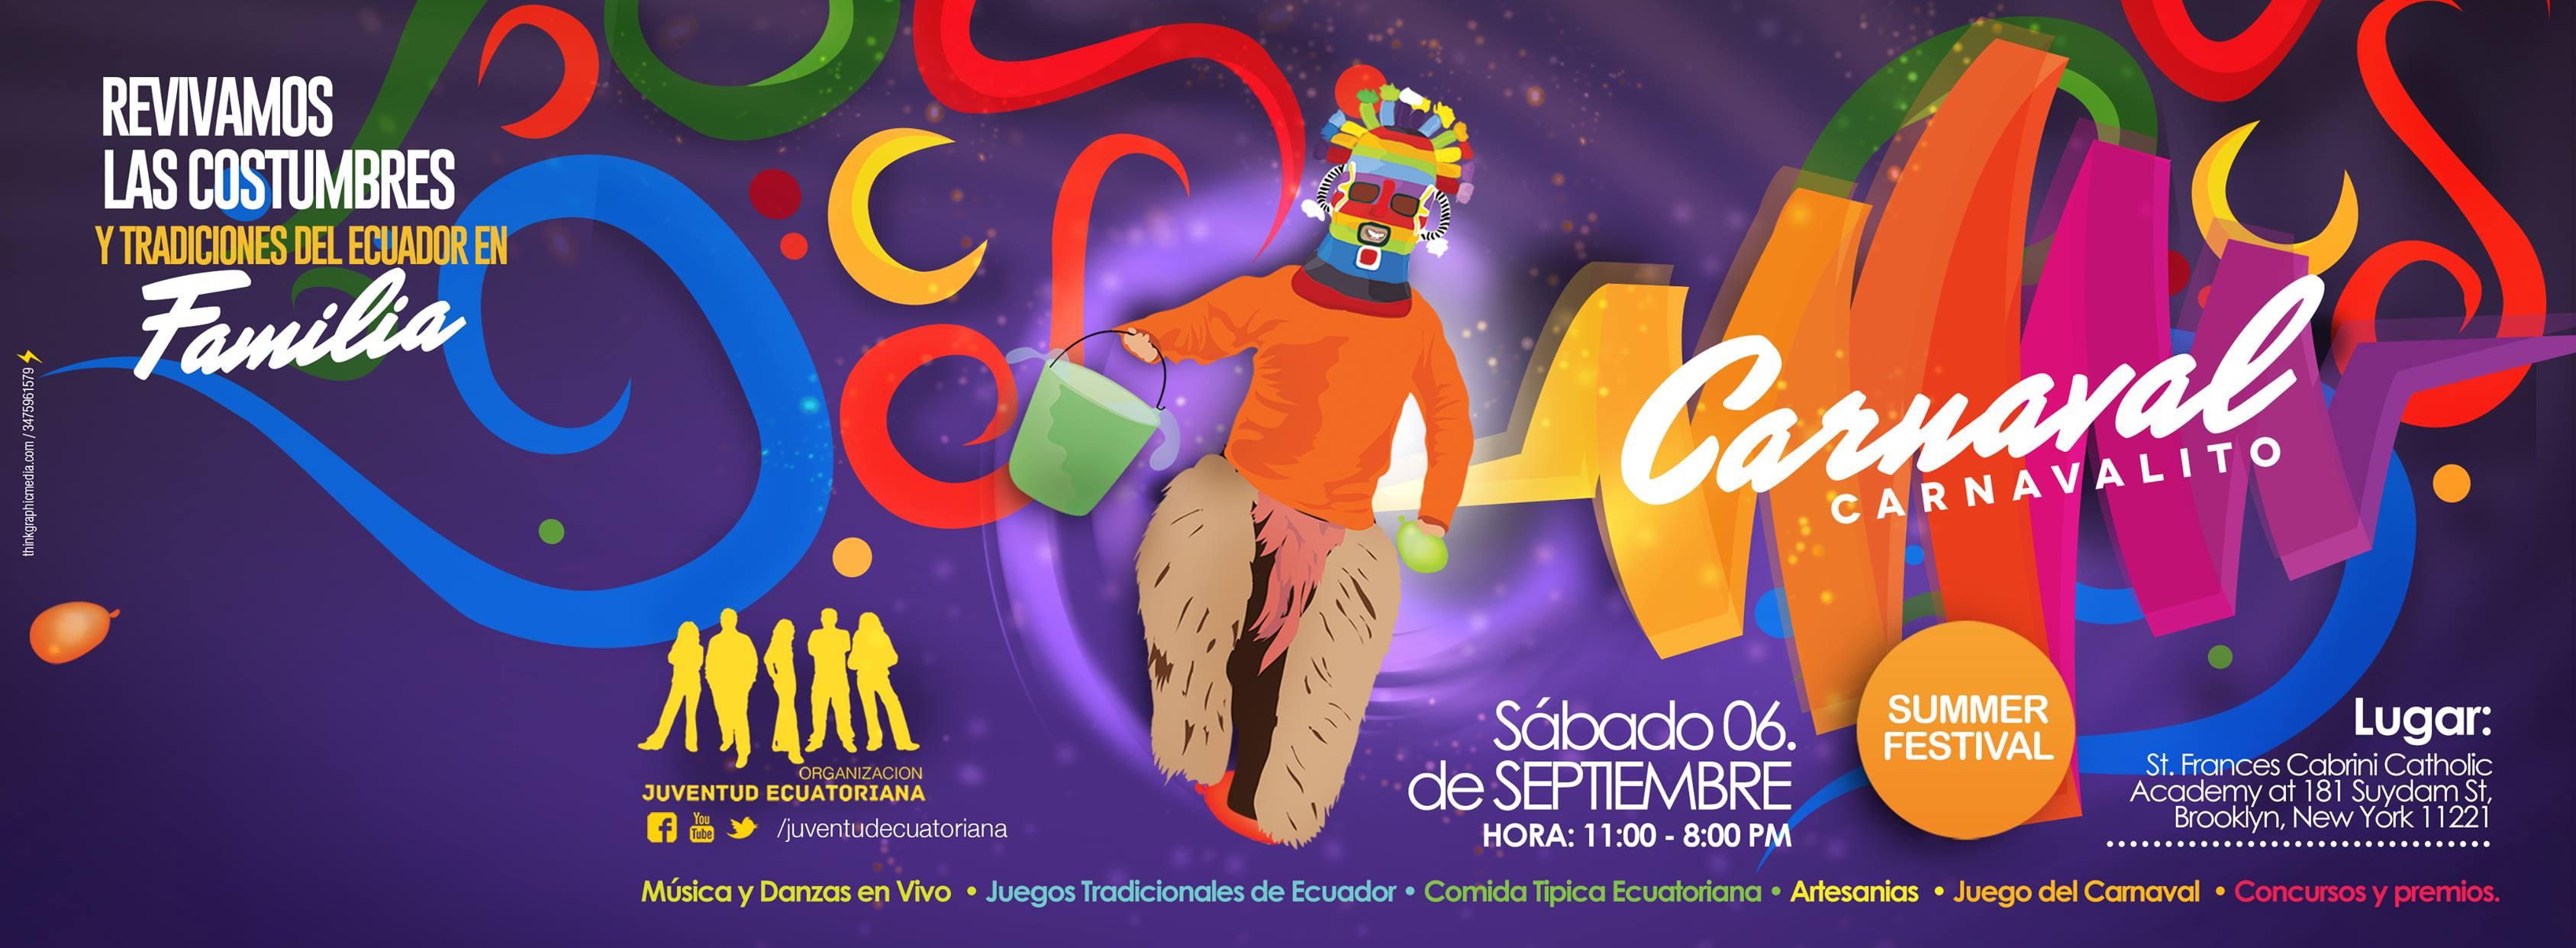 Carnaval Carnavalito